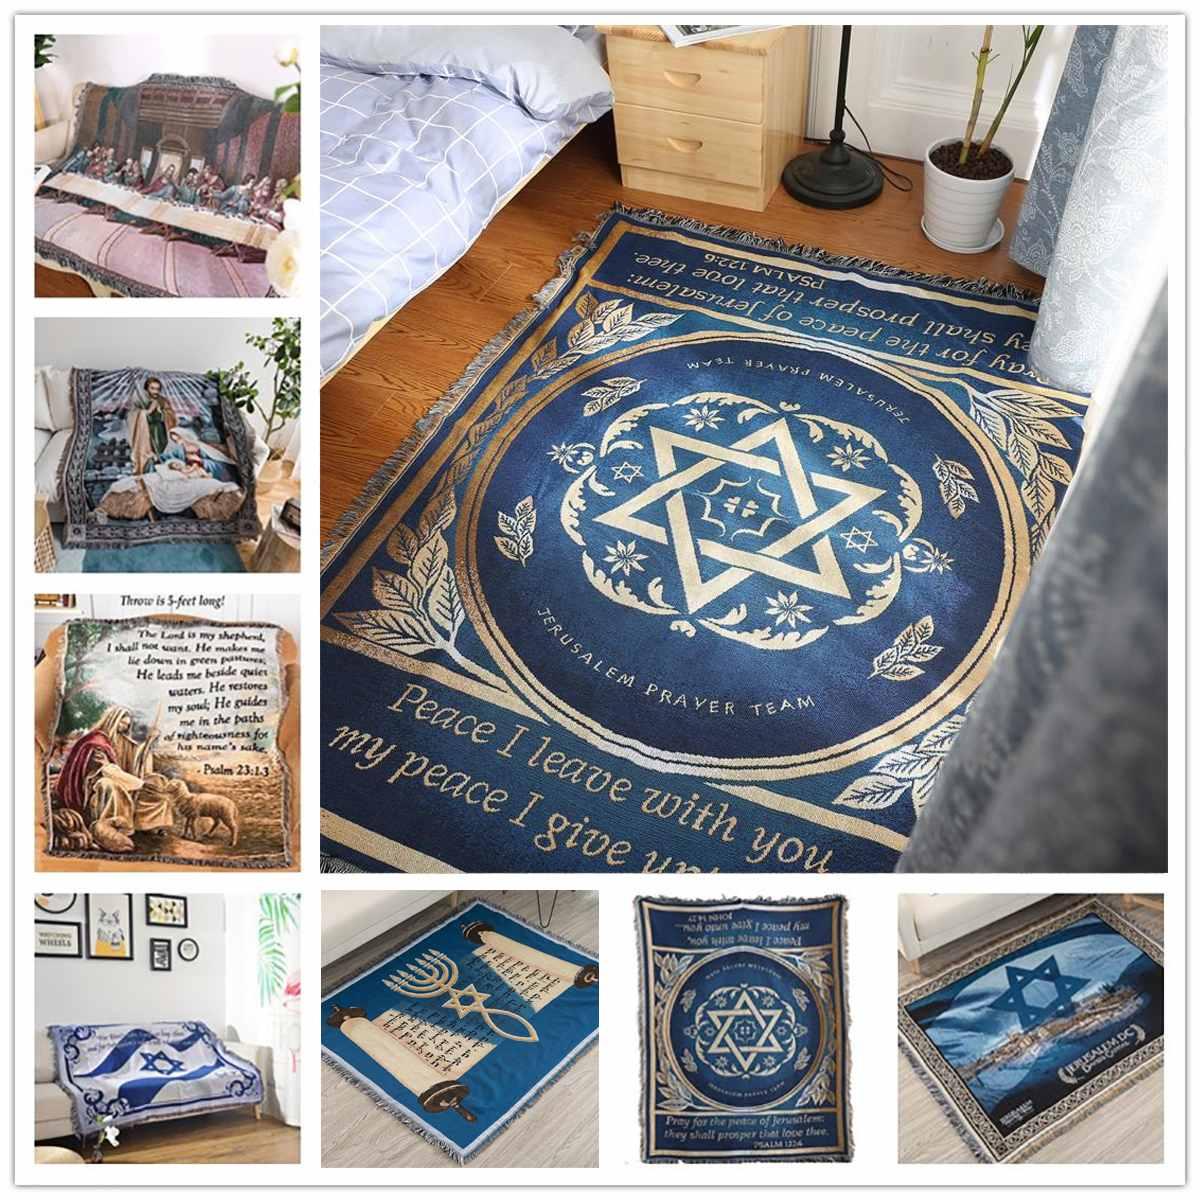 Judaism Israel Prayer Blanket Carpet Tapestry Sofa Knit Throw Towel Christian Gift Livingroom Bed Blanket Middle East Decoration